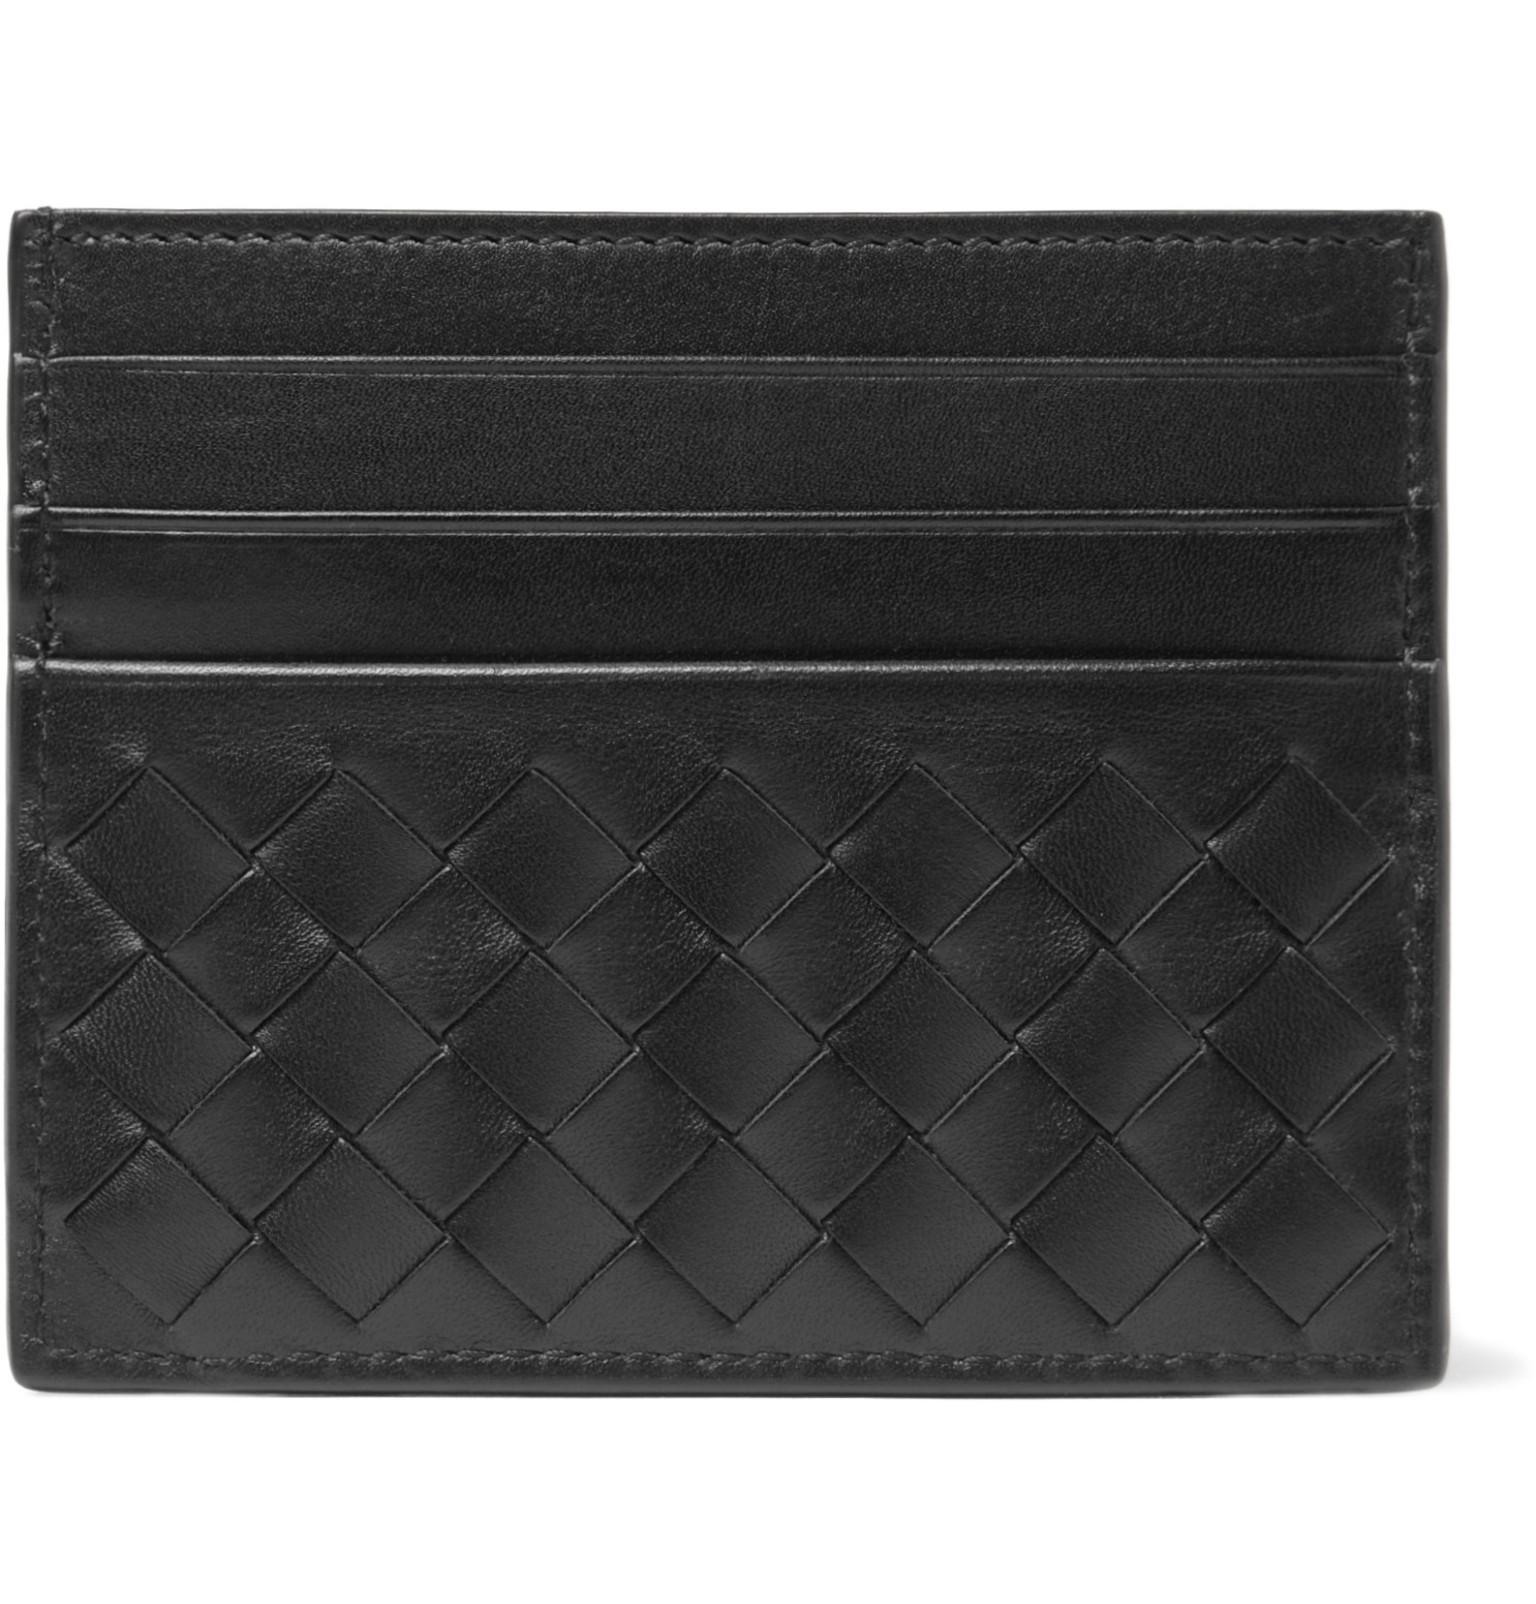 b60c8d5416b8f Bottega Veneta - Intrecciato Leather Cardholder